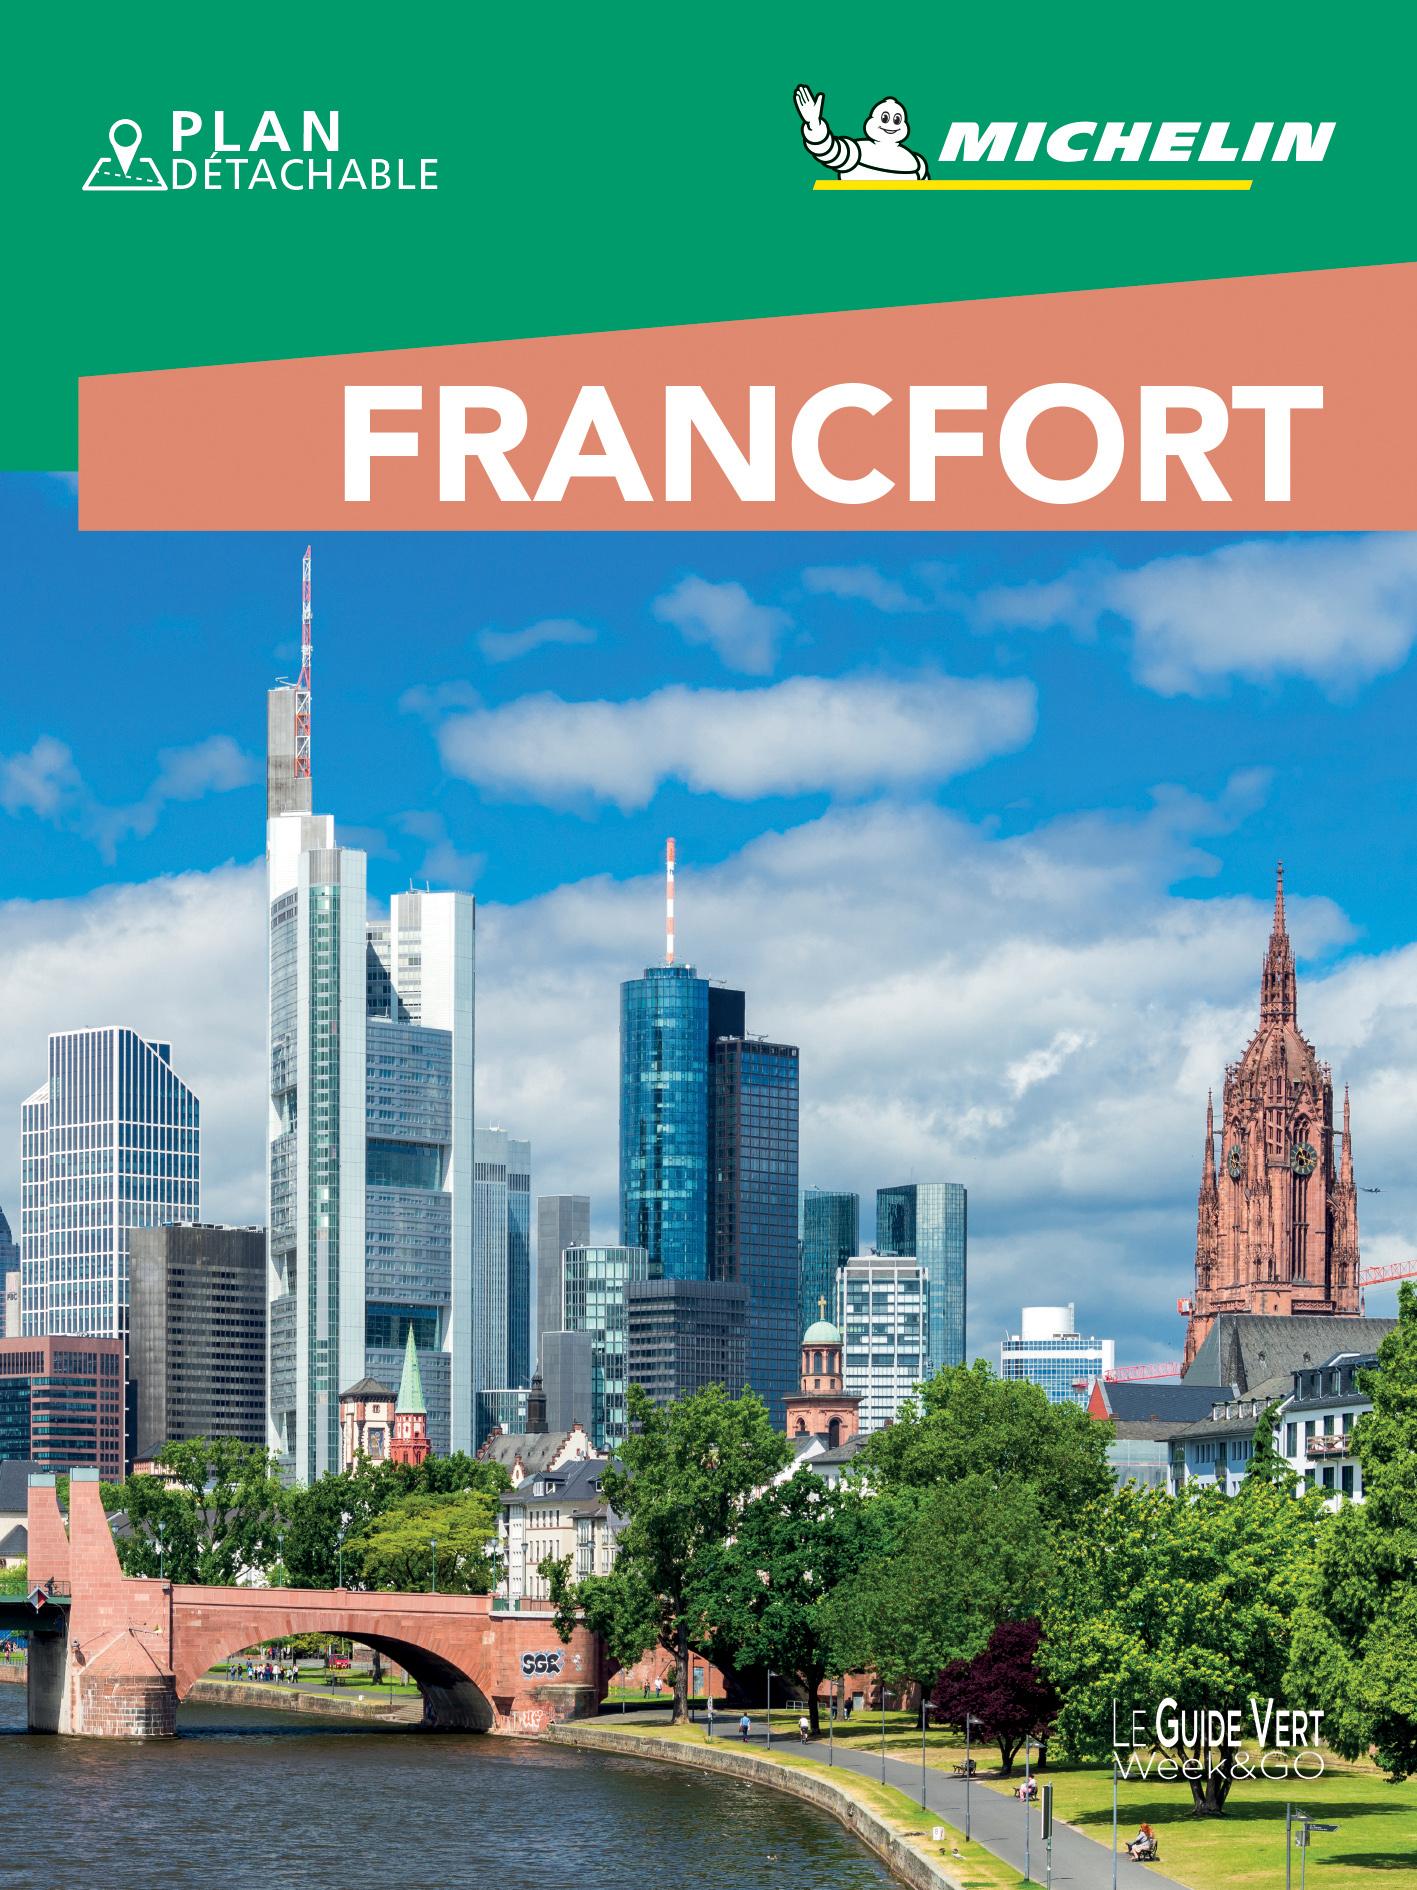 Michelin Le Guide Vert Francfort